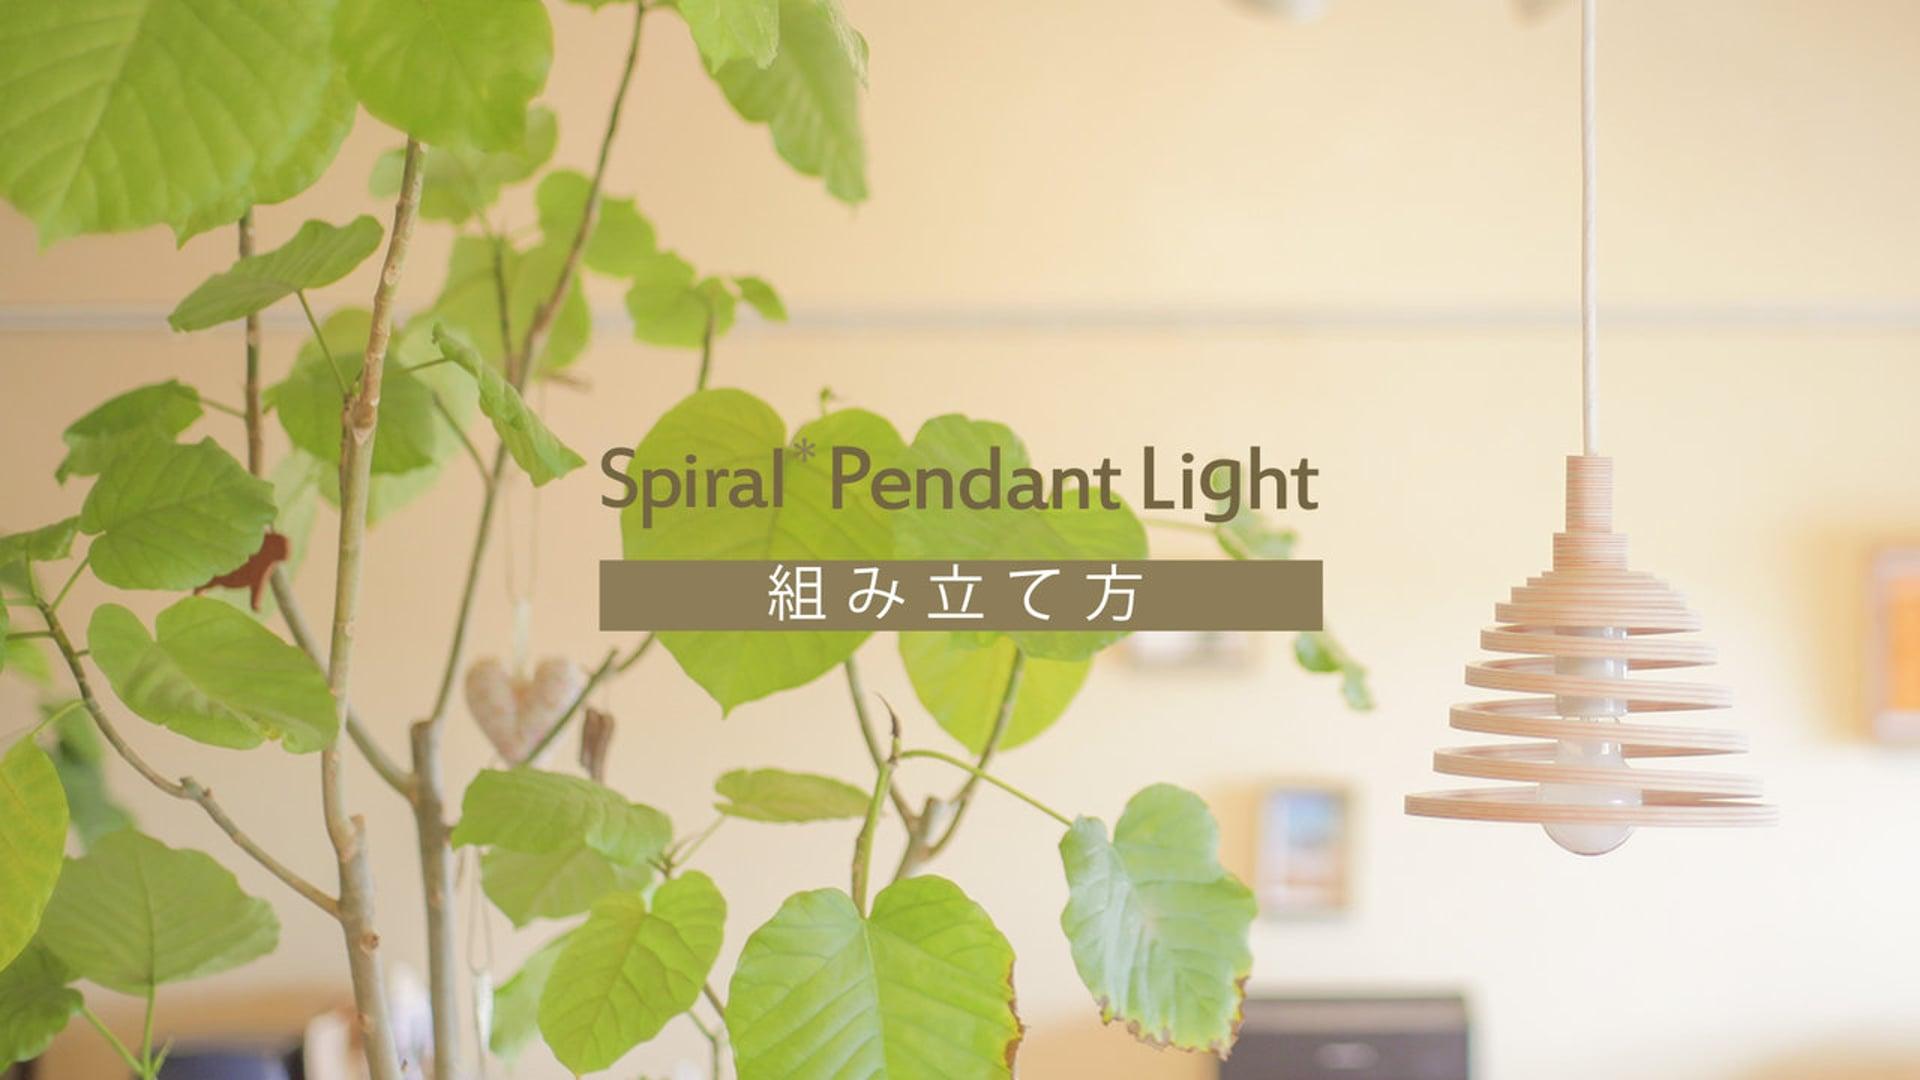 Spiral* Pendant Light (組み立て)